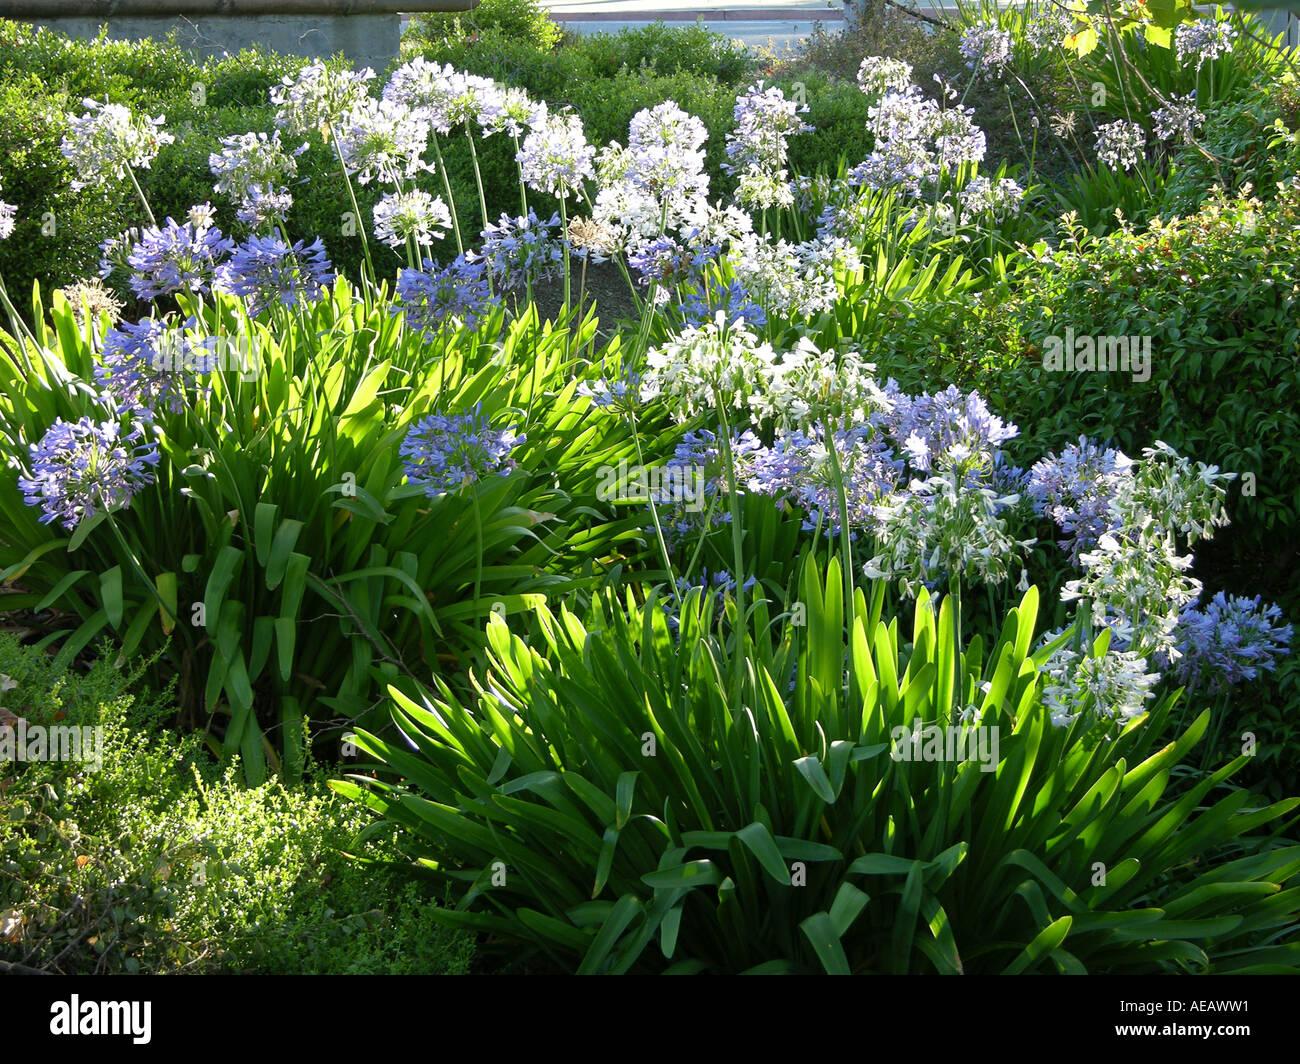 Agapanthus or lily nile flower usa stock photos agapanthus or lily agapanthus lily of the nile african lily larkspur california usa izmirmasajfo